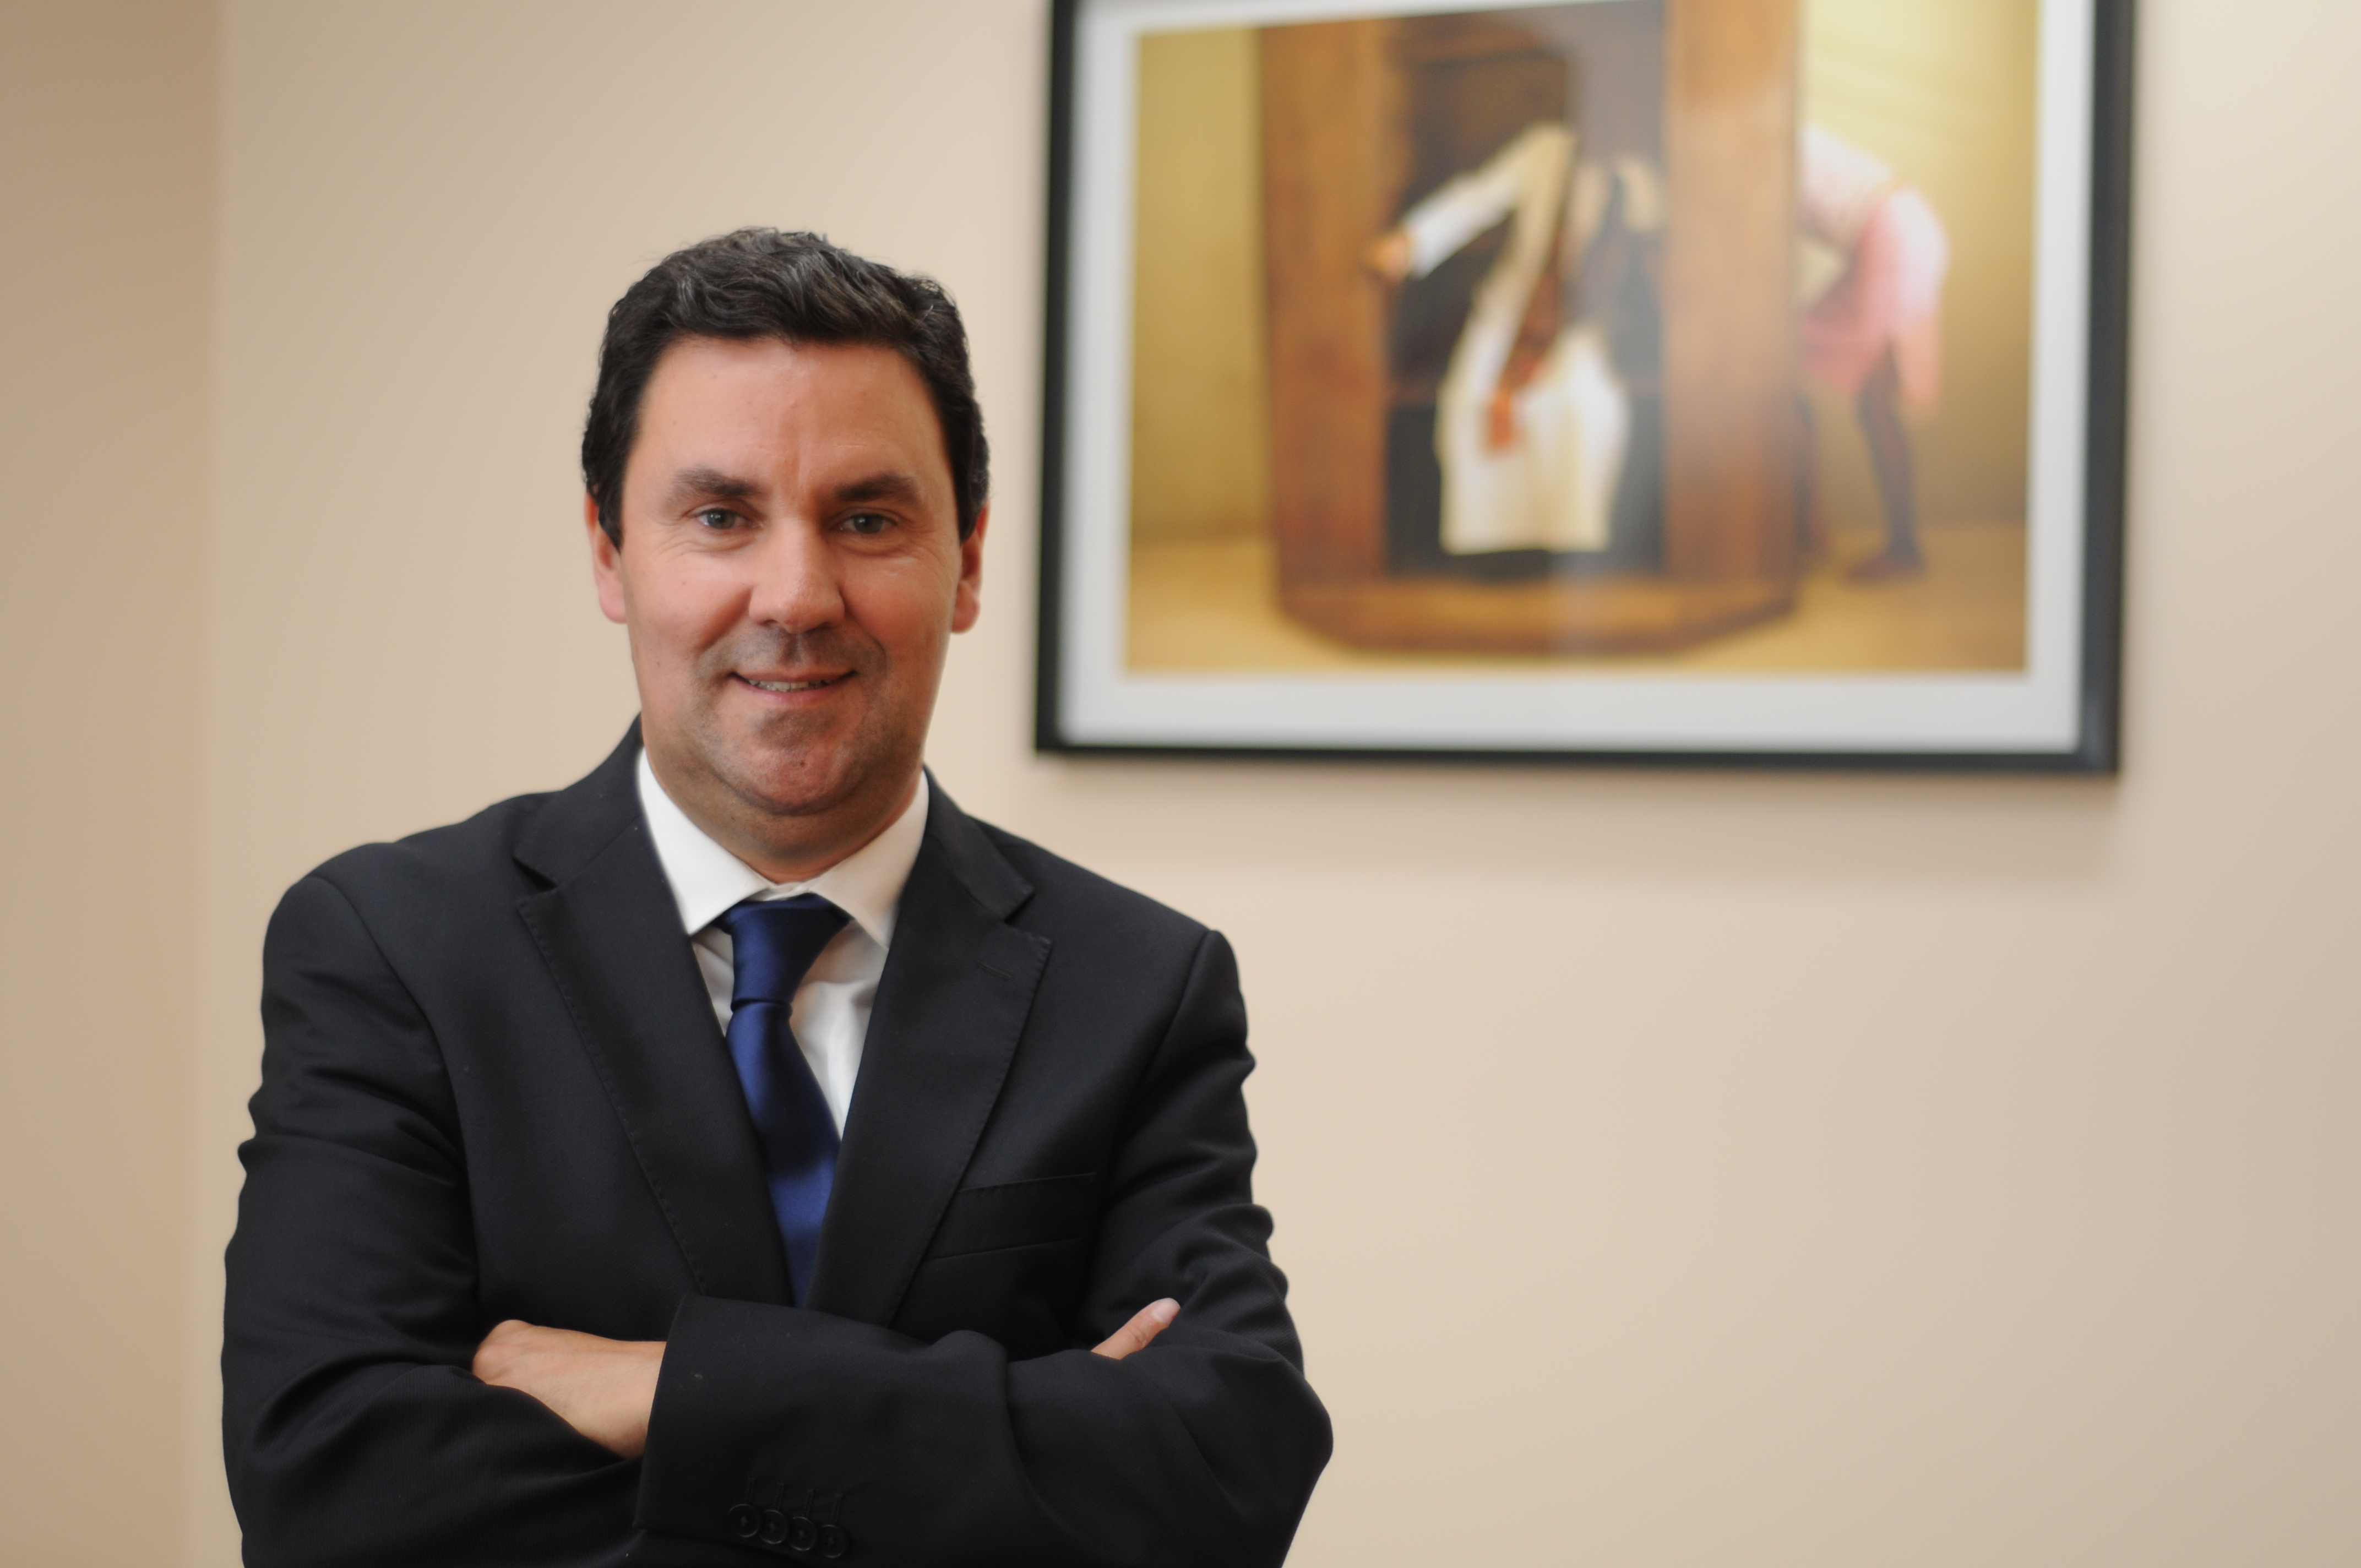 Rui Jorge Santos